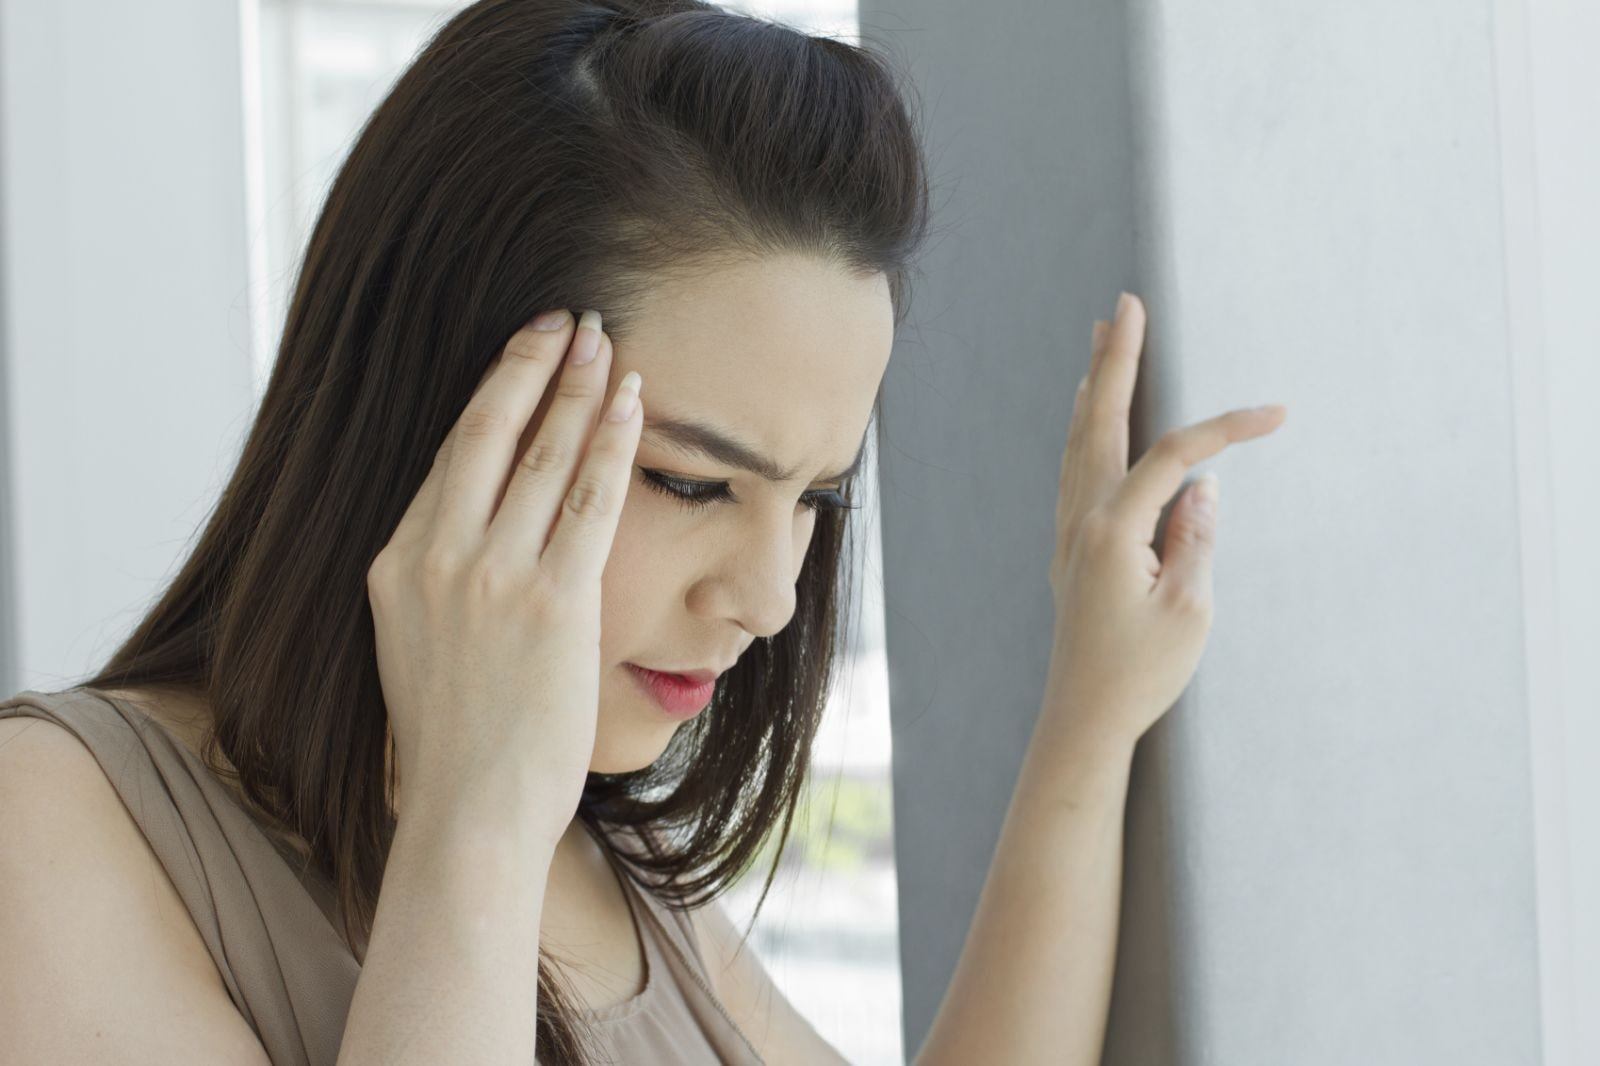 4 Reasons You May Be Feeling Lightheaded